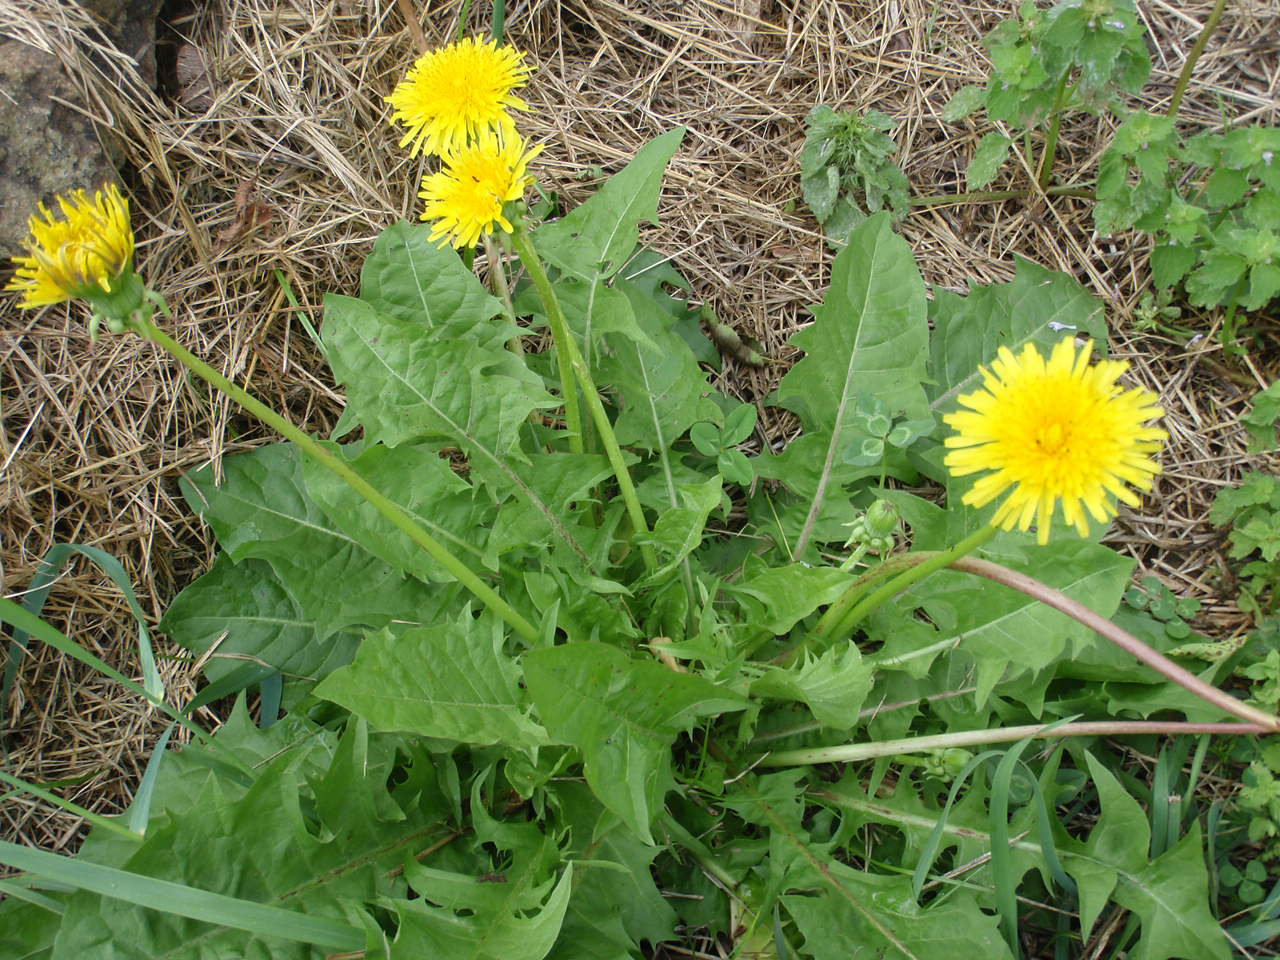 Survival Skills: Find Wild Edible Plants, Worldwide